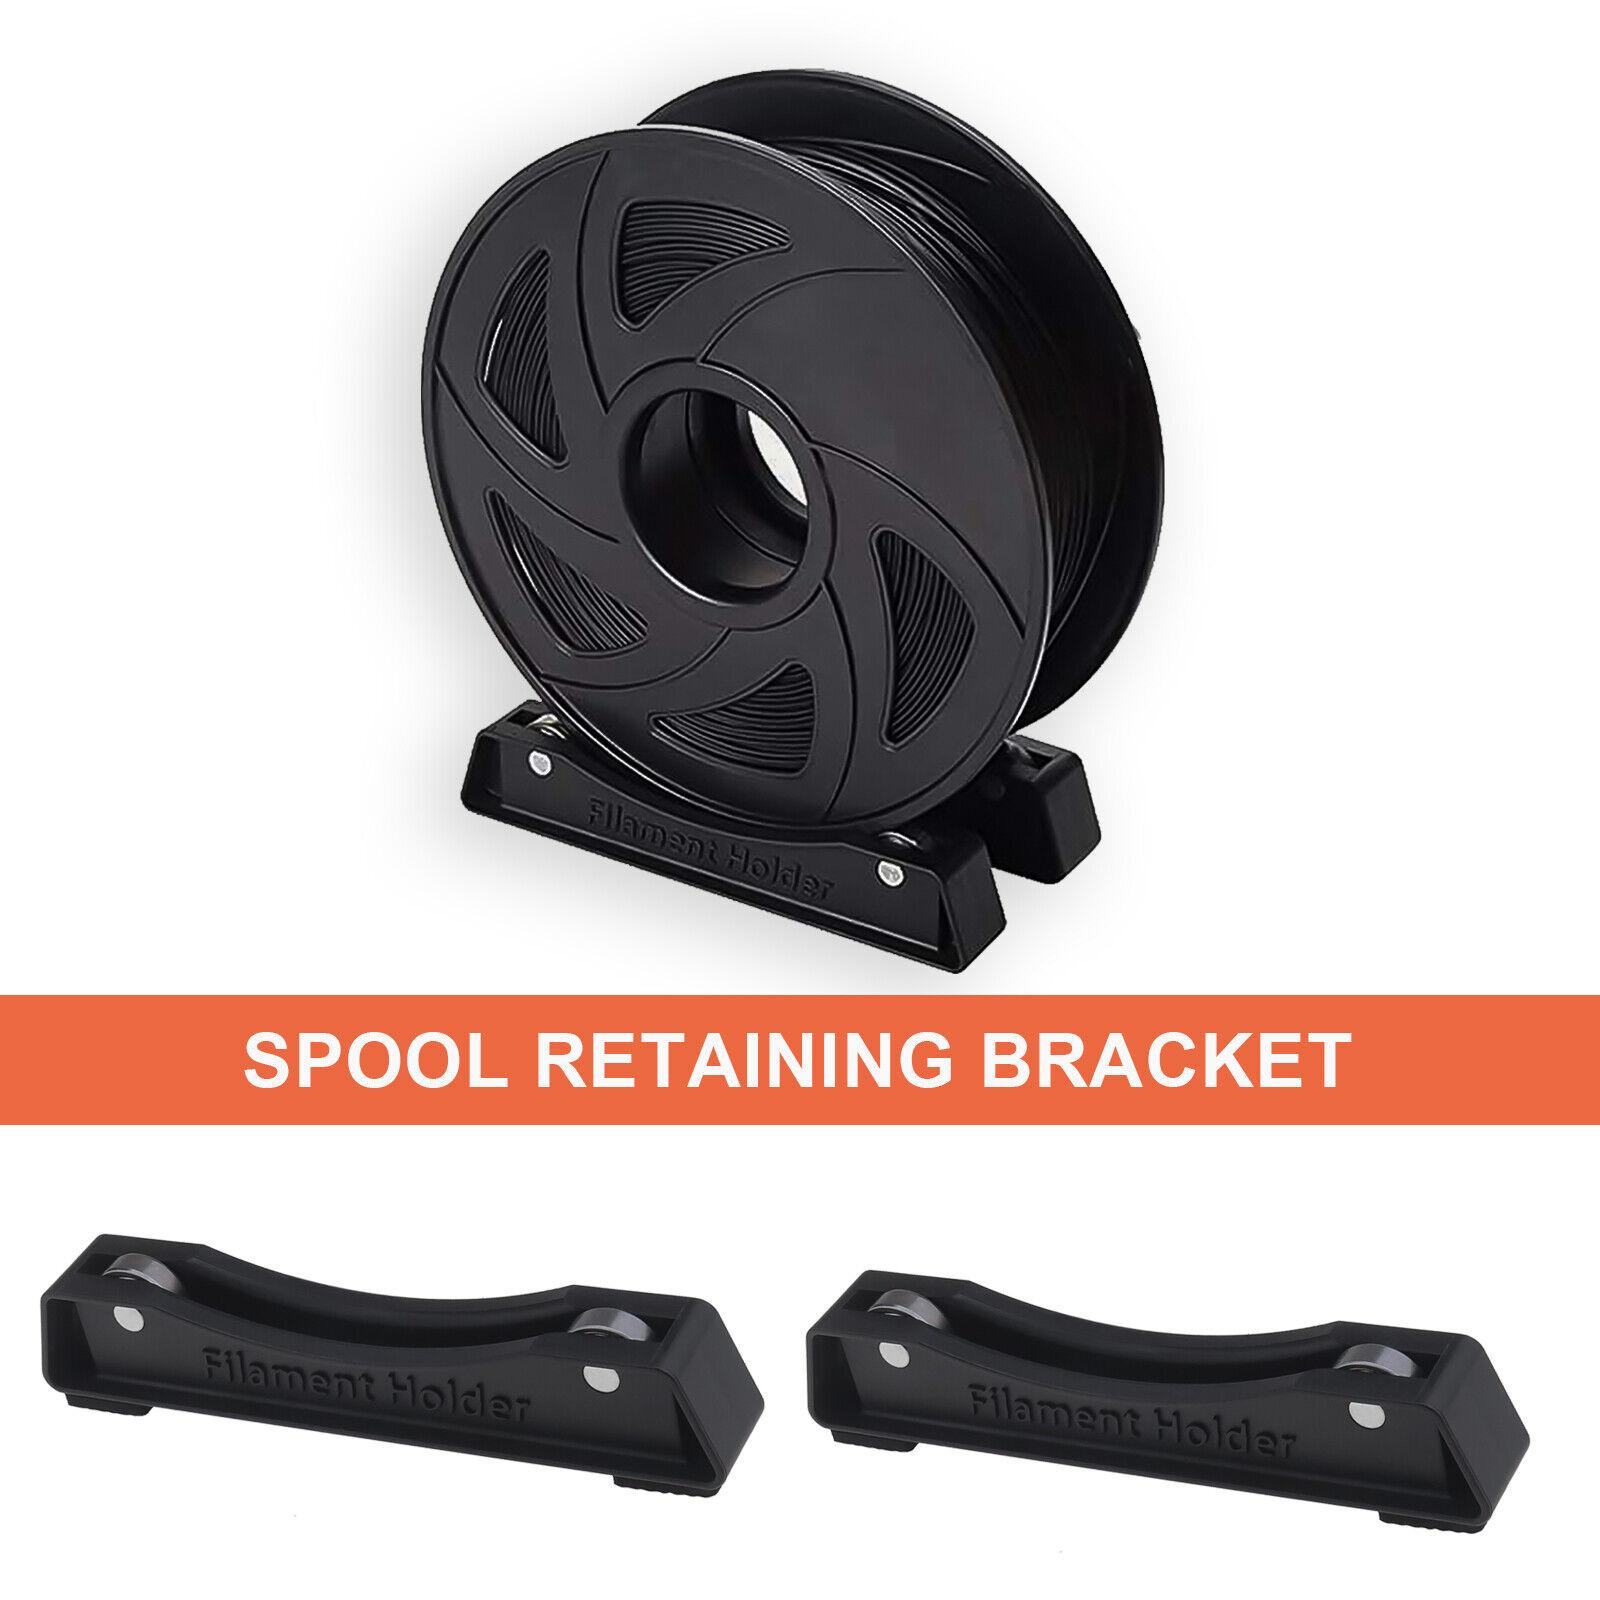 2Pcs Universal Adjustable Filament Mount Rack Bracket for 3D Printer PLA ABS